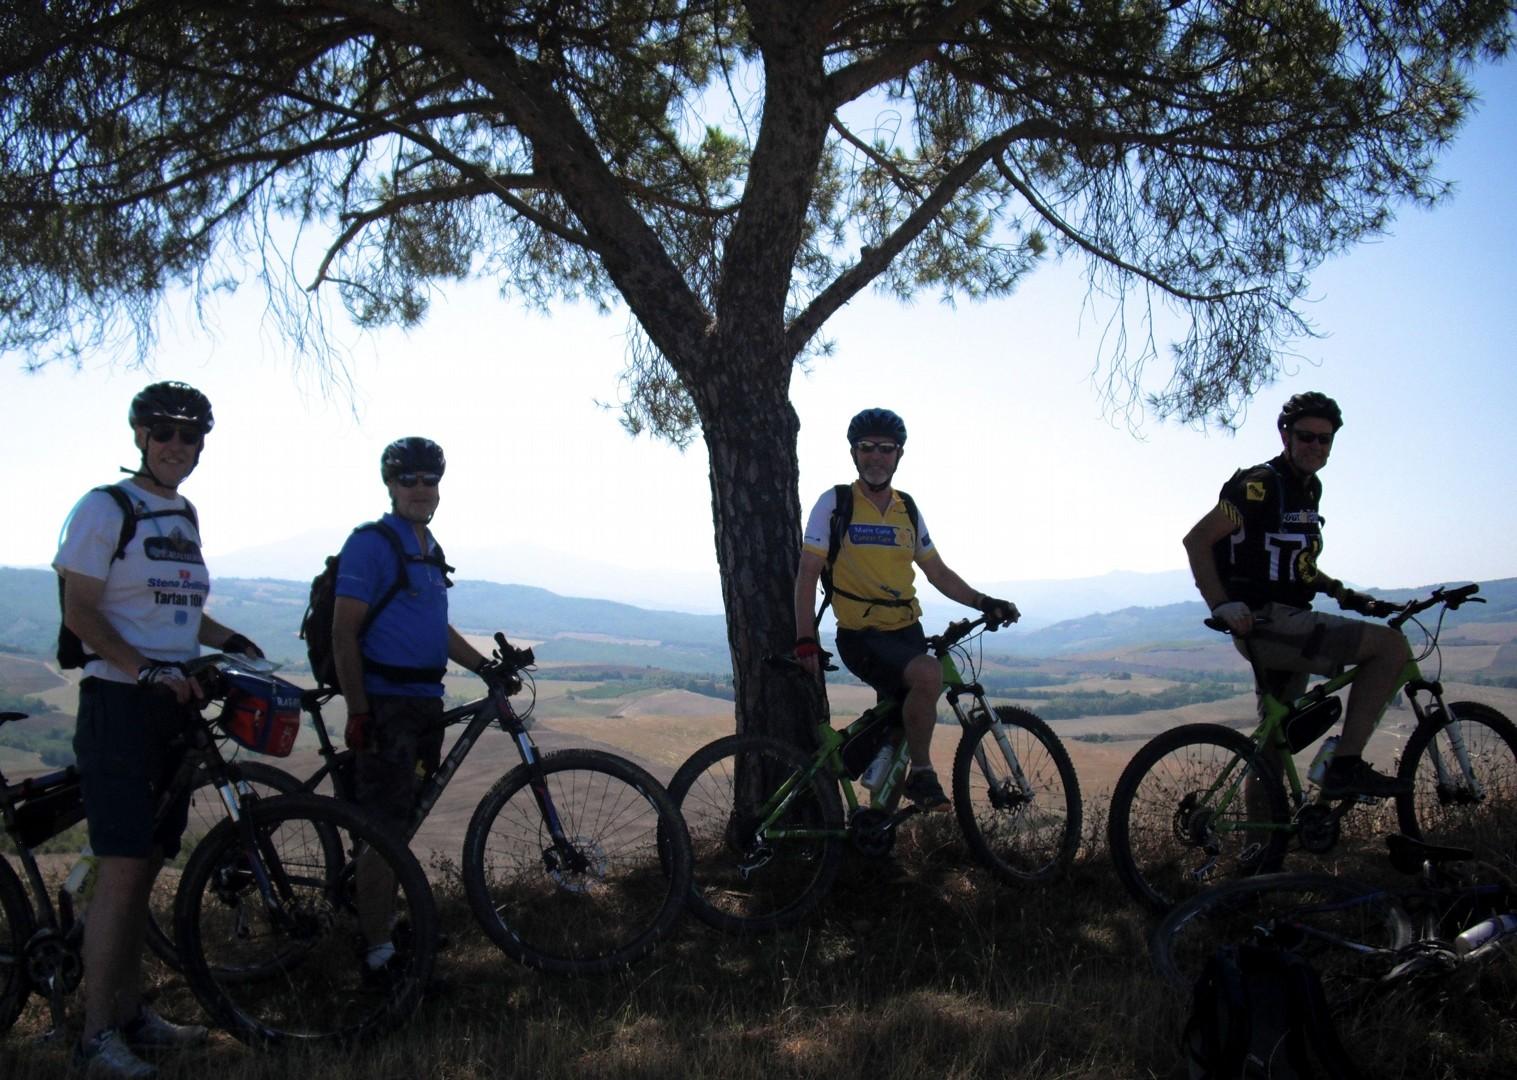 mountain-biking-holiday-tuscany-nature.jpg - Italy - Tuscany - Sacred Routes  - Self Guided Mountain Bike Holiday - Italia Mountain Biking